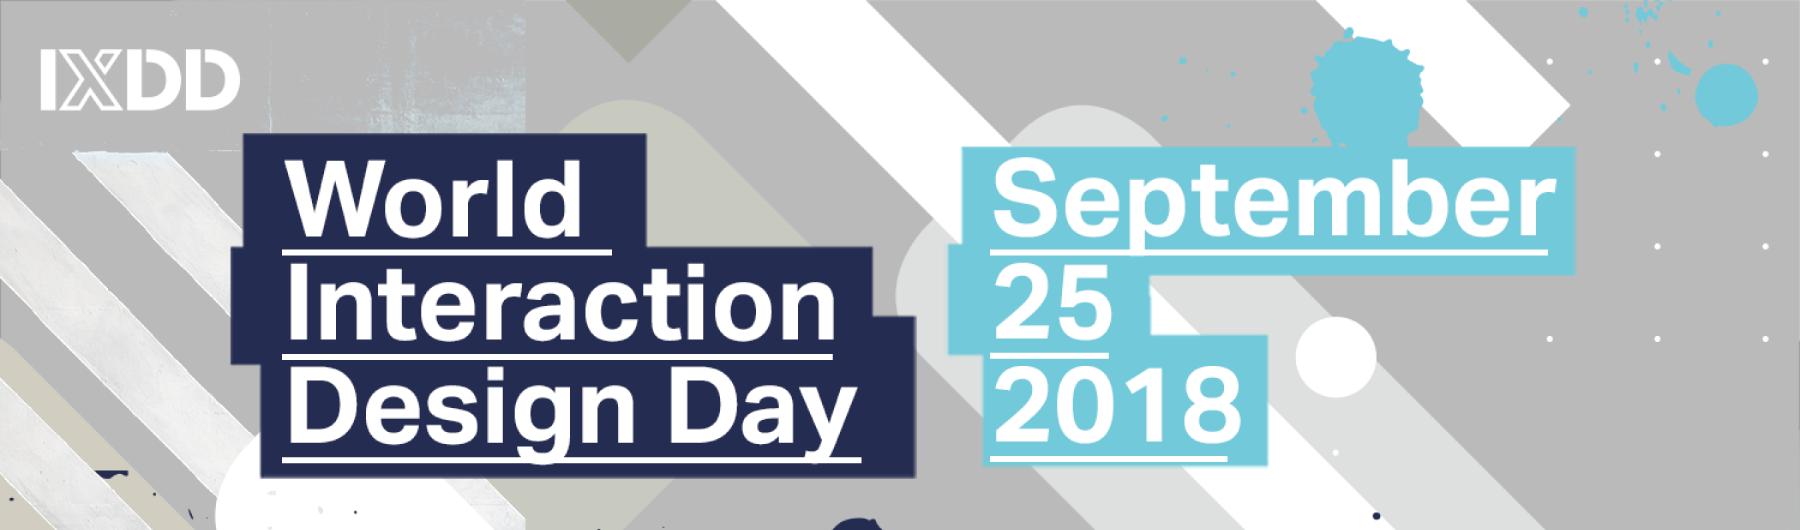 World Interaction Design Day 2018